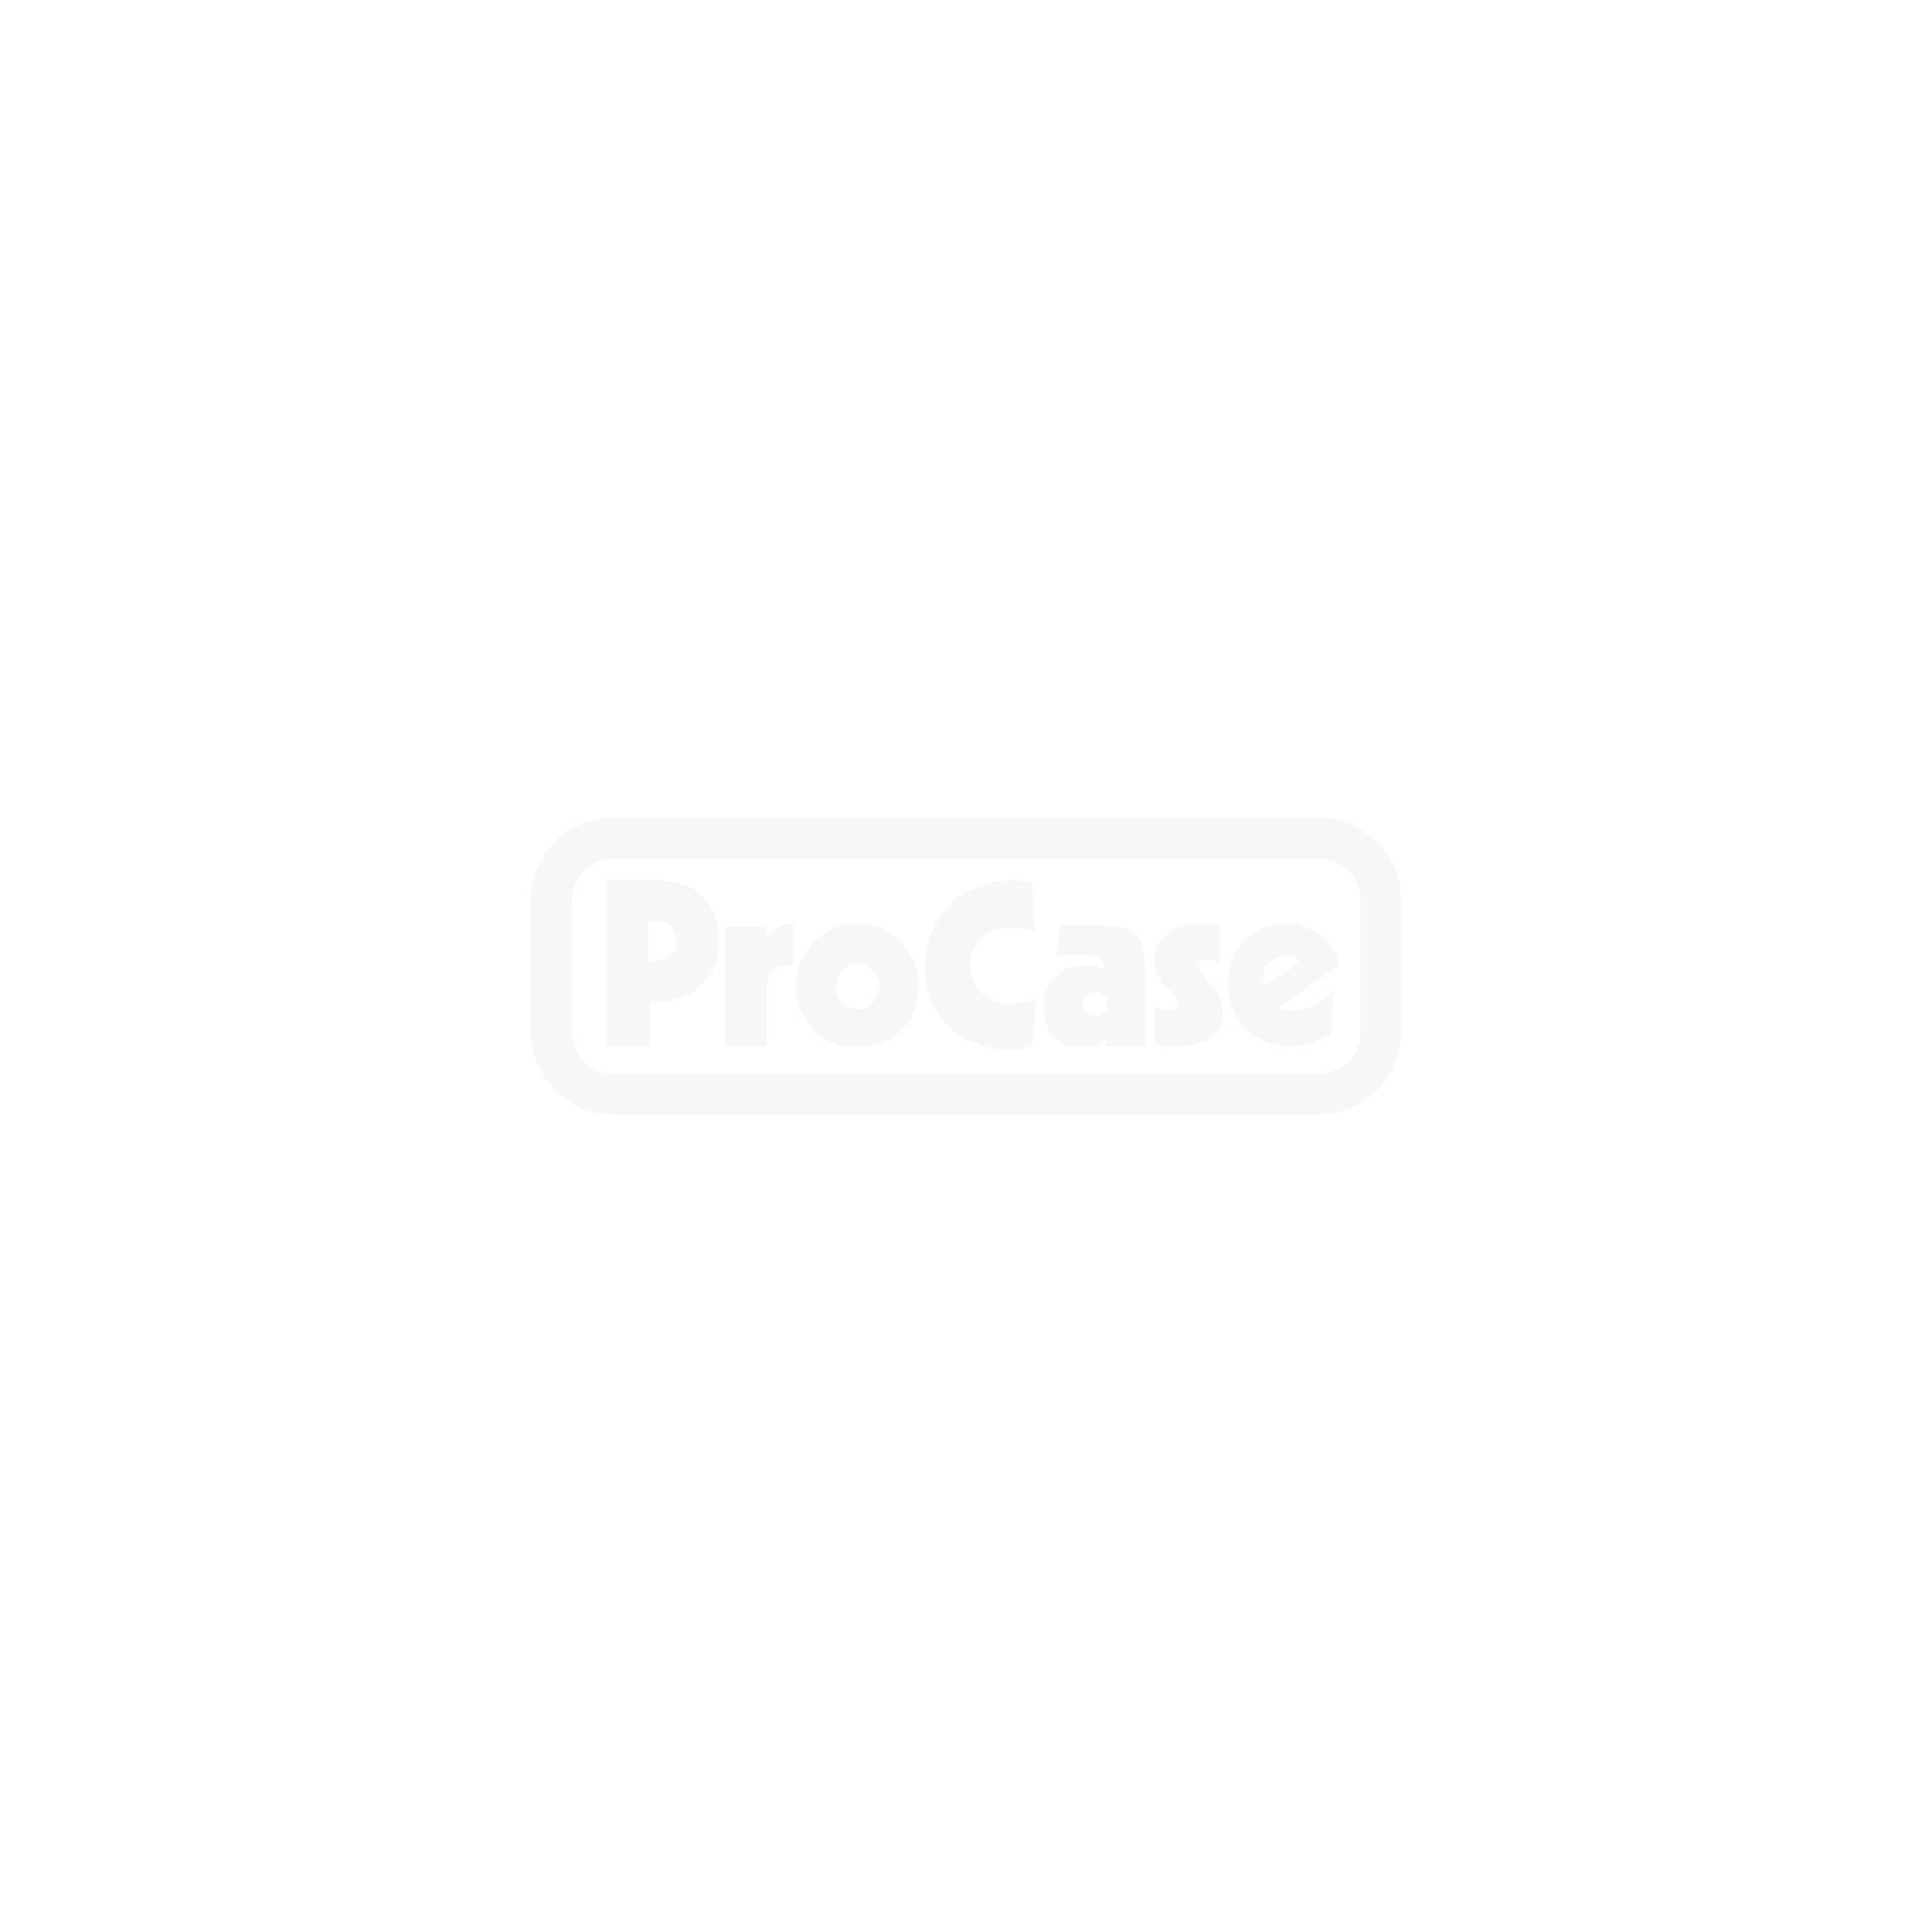 Flightcase für Fujinon ELH-112A & IDX IA-200A